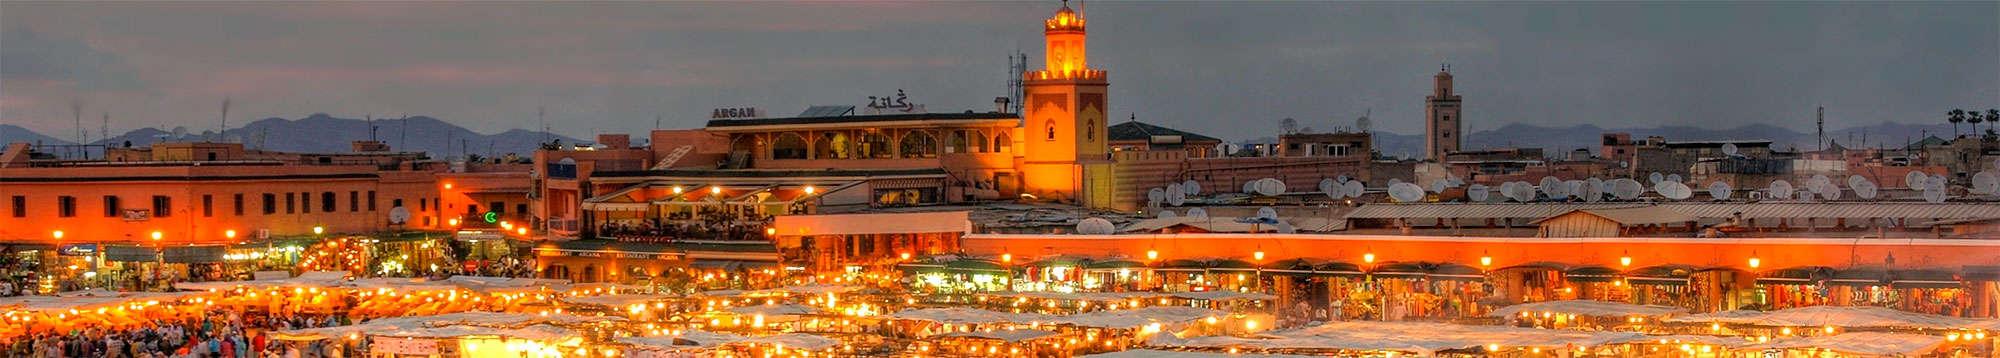 Week end e soggiorni Marrakech